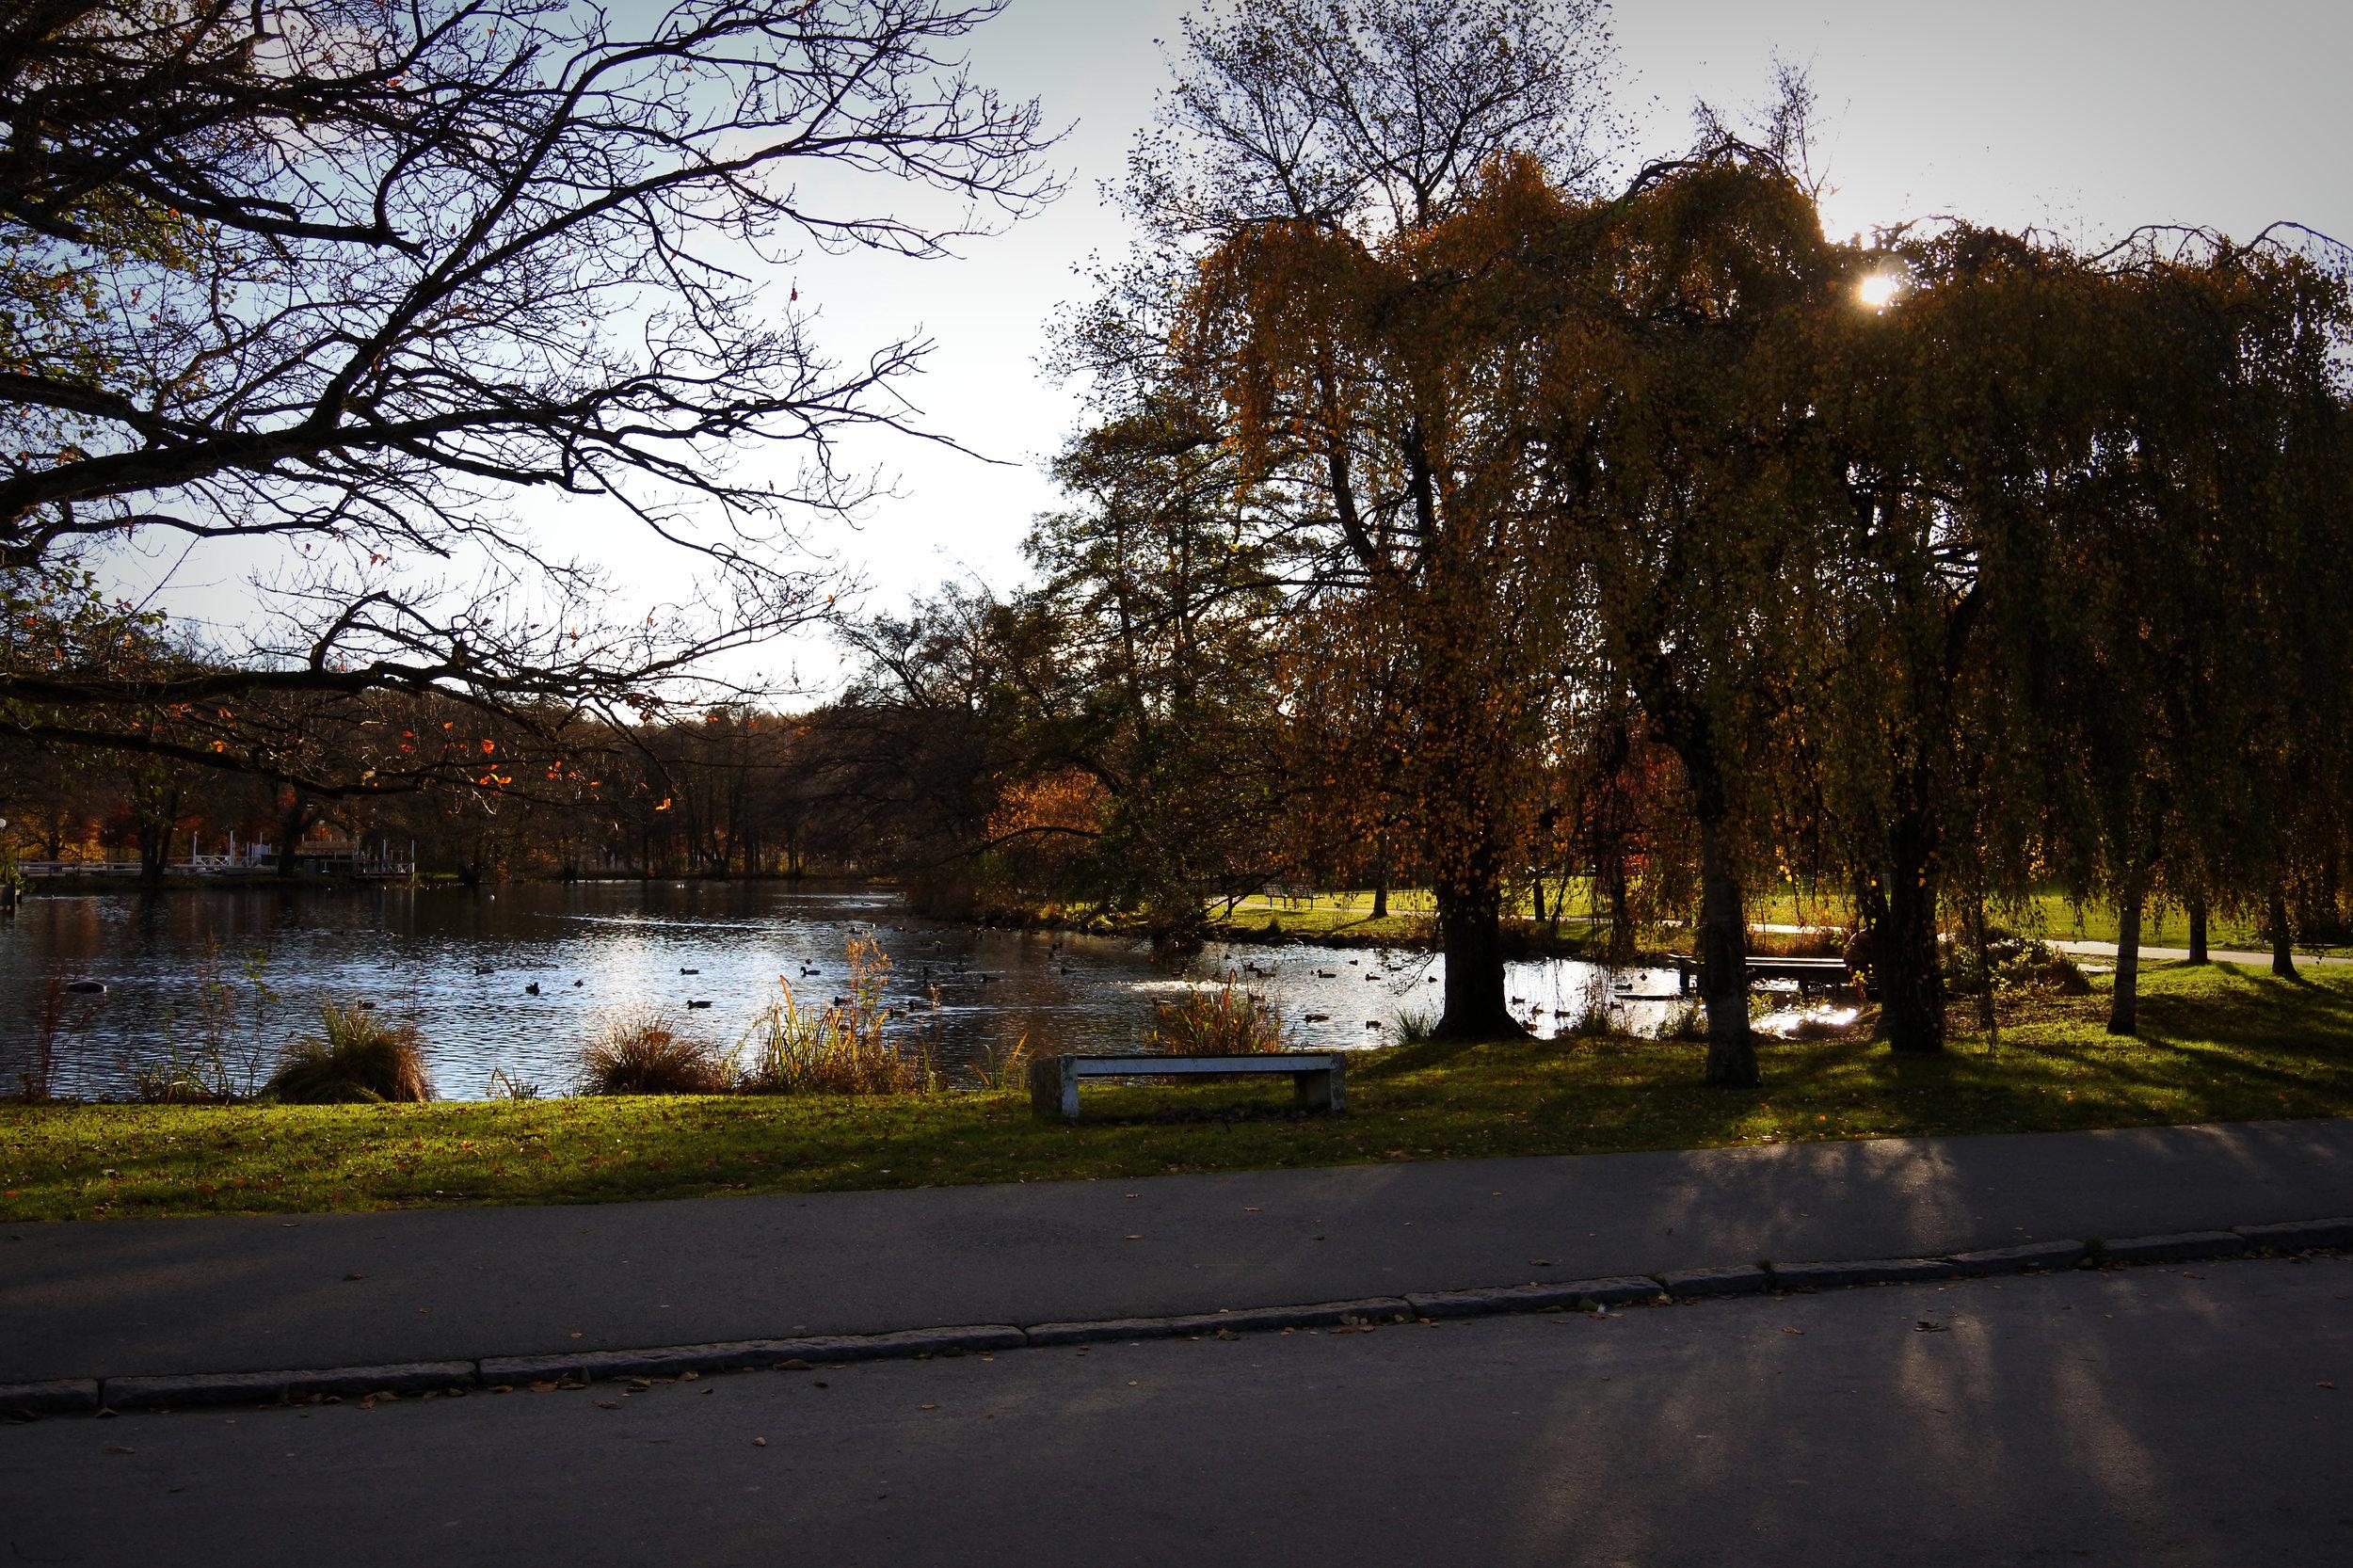 Slottsskogen - think a Swedish version of Central Park.